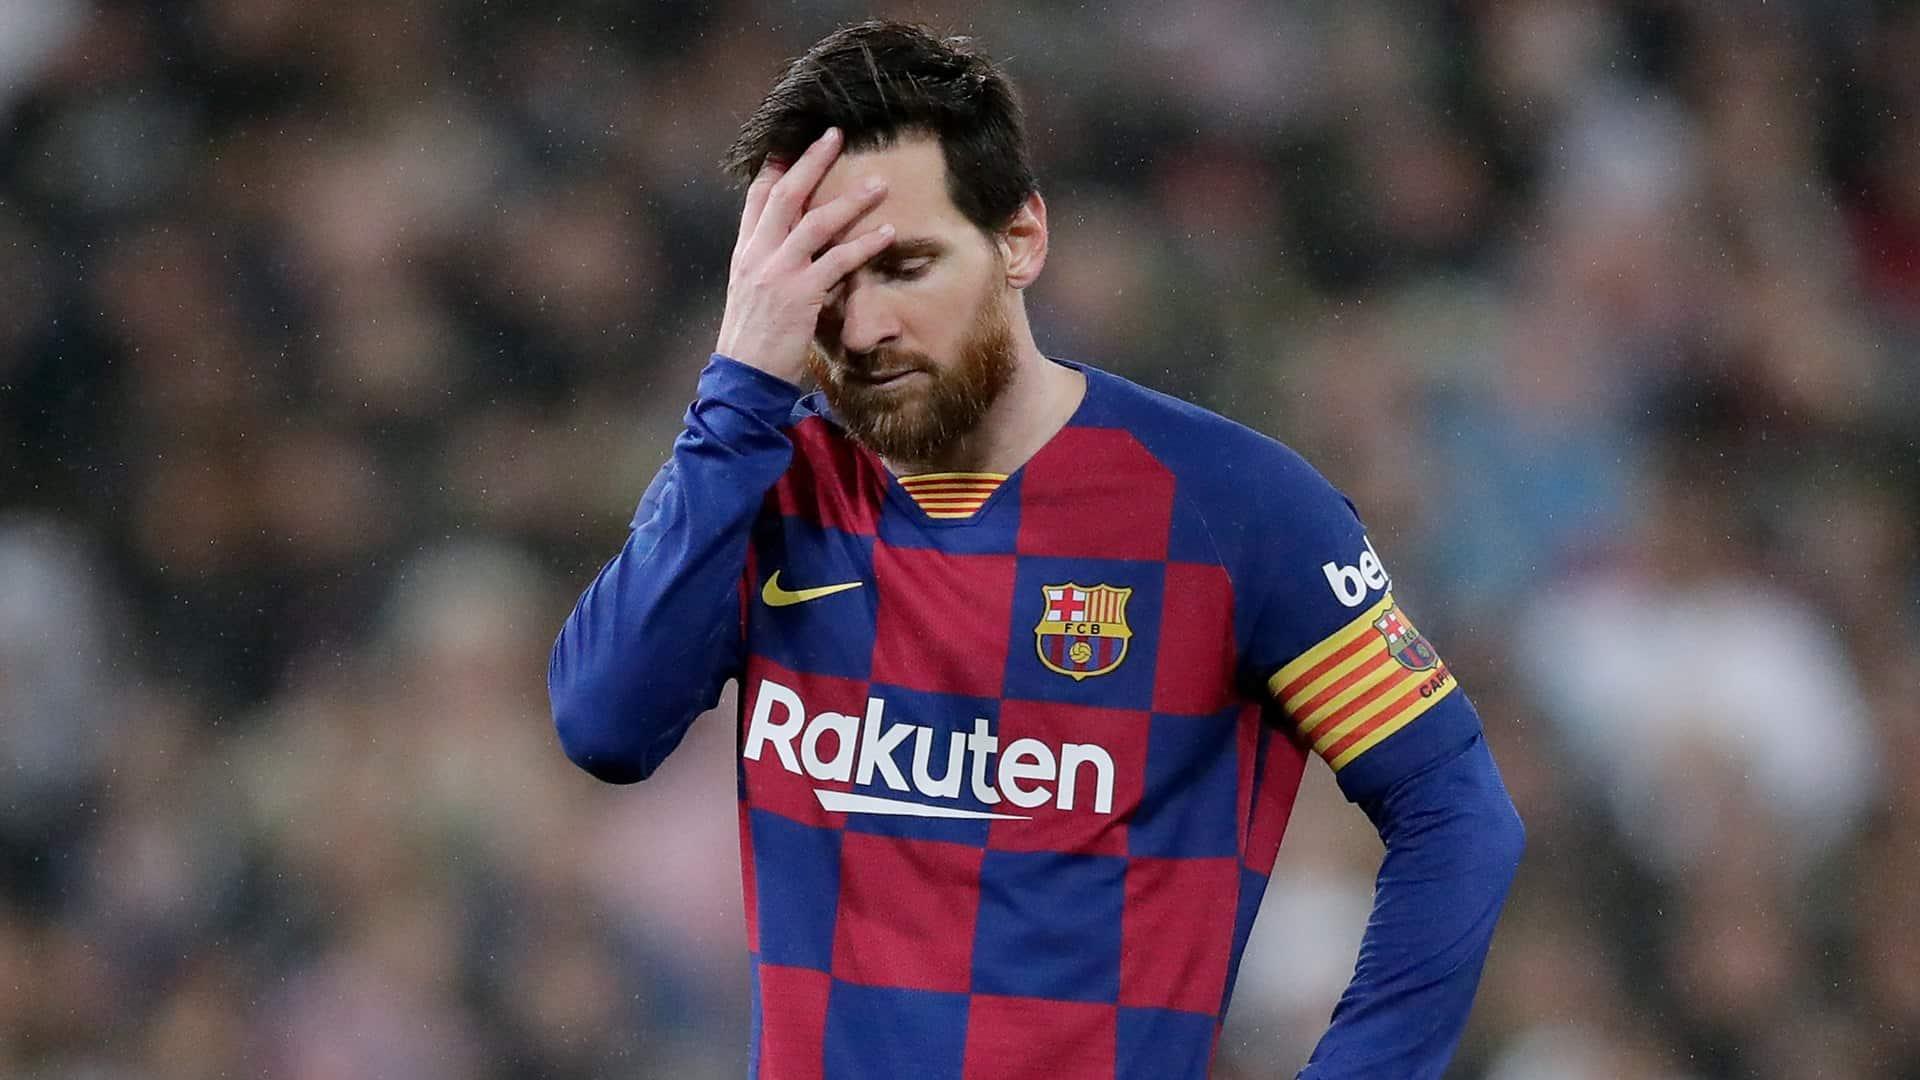 Messi estaría en profundo estado de tristeza